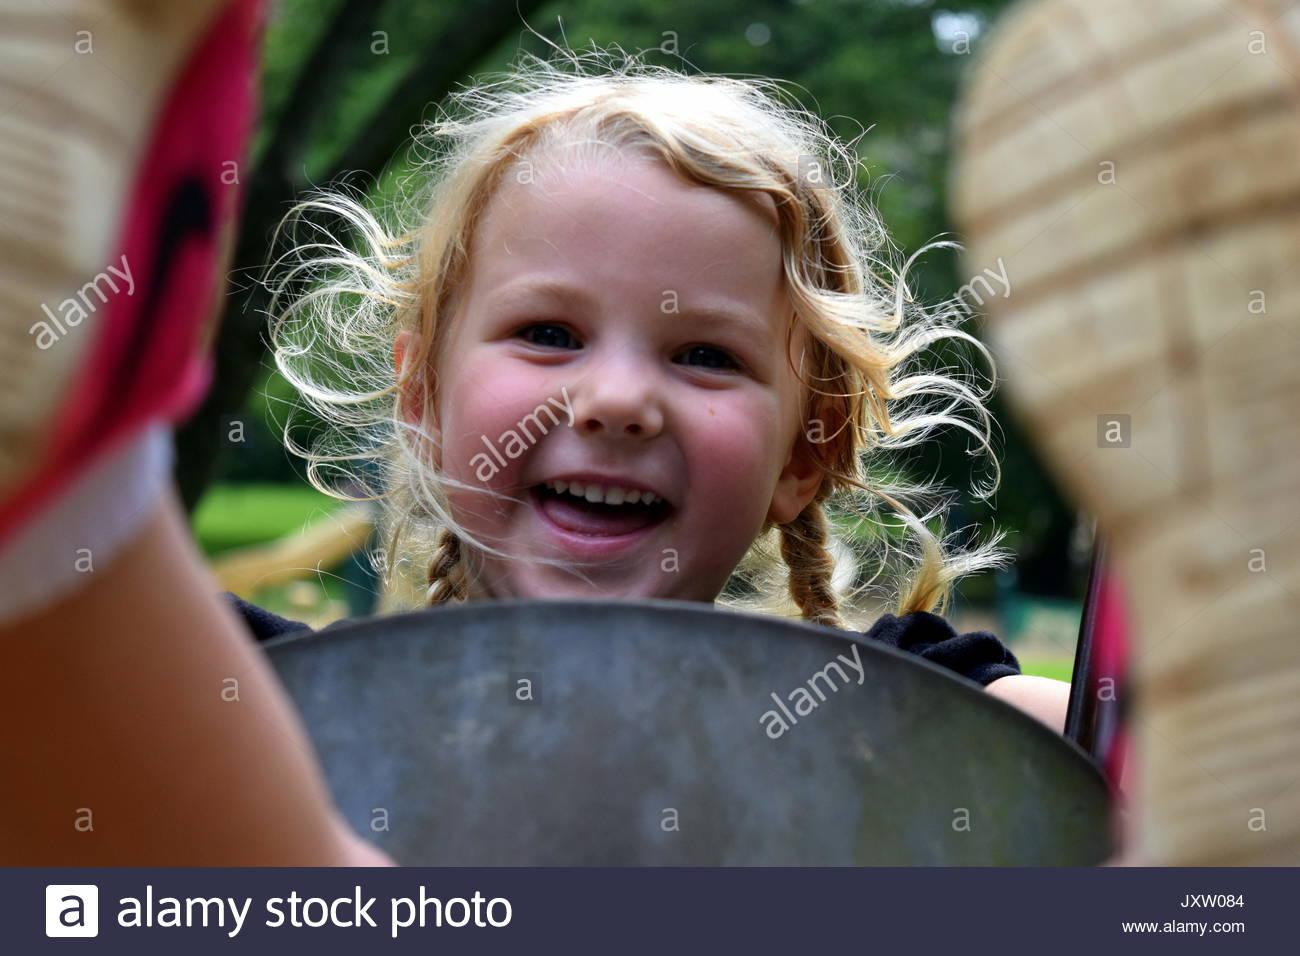 Smiling preschool girl swinging dans un parc Photo Stock